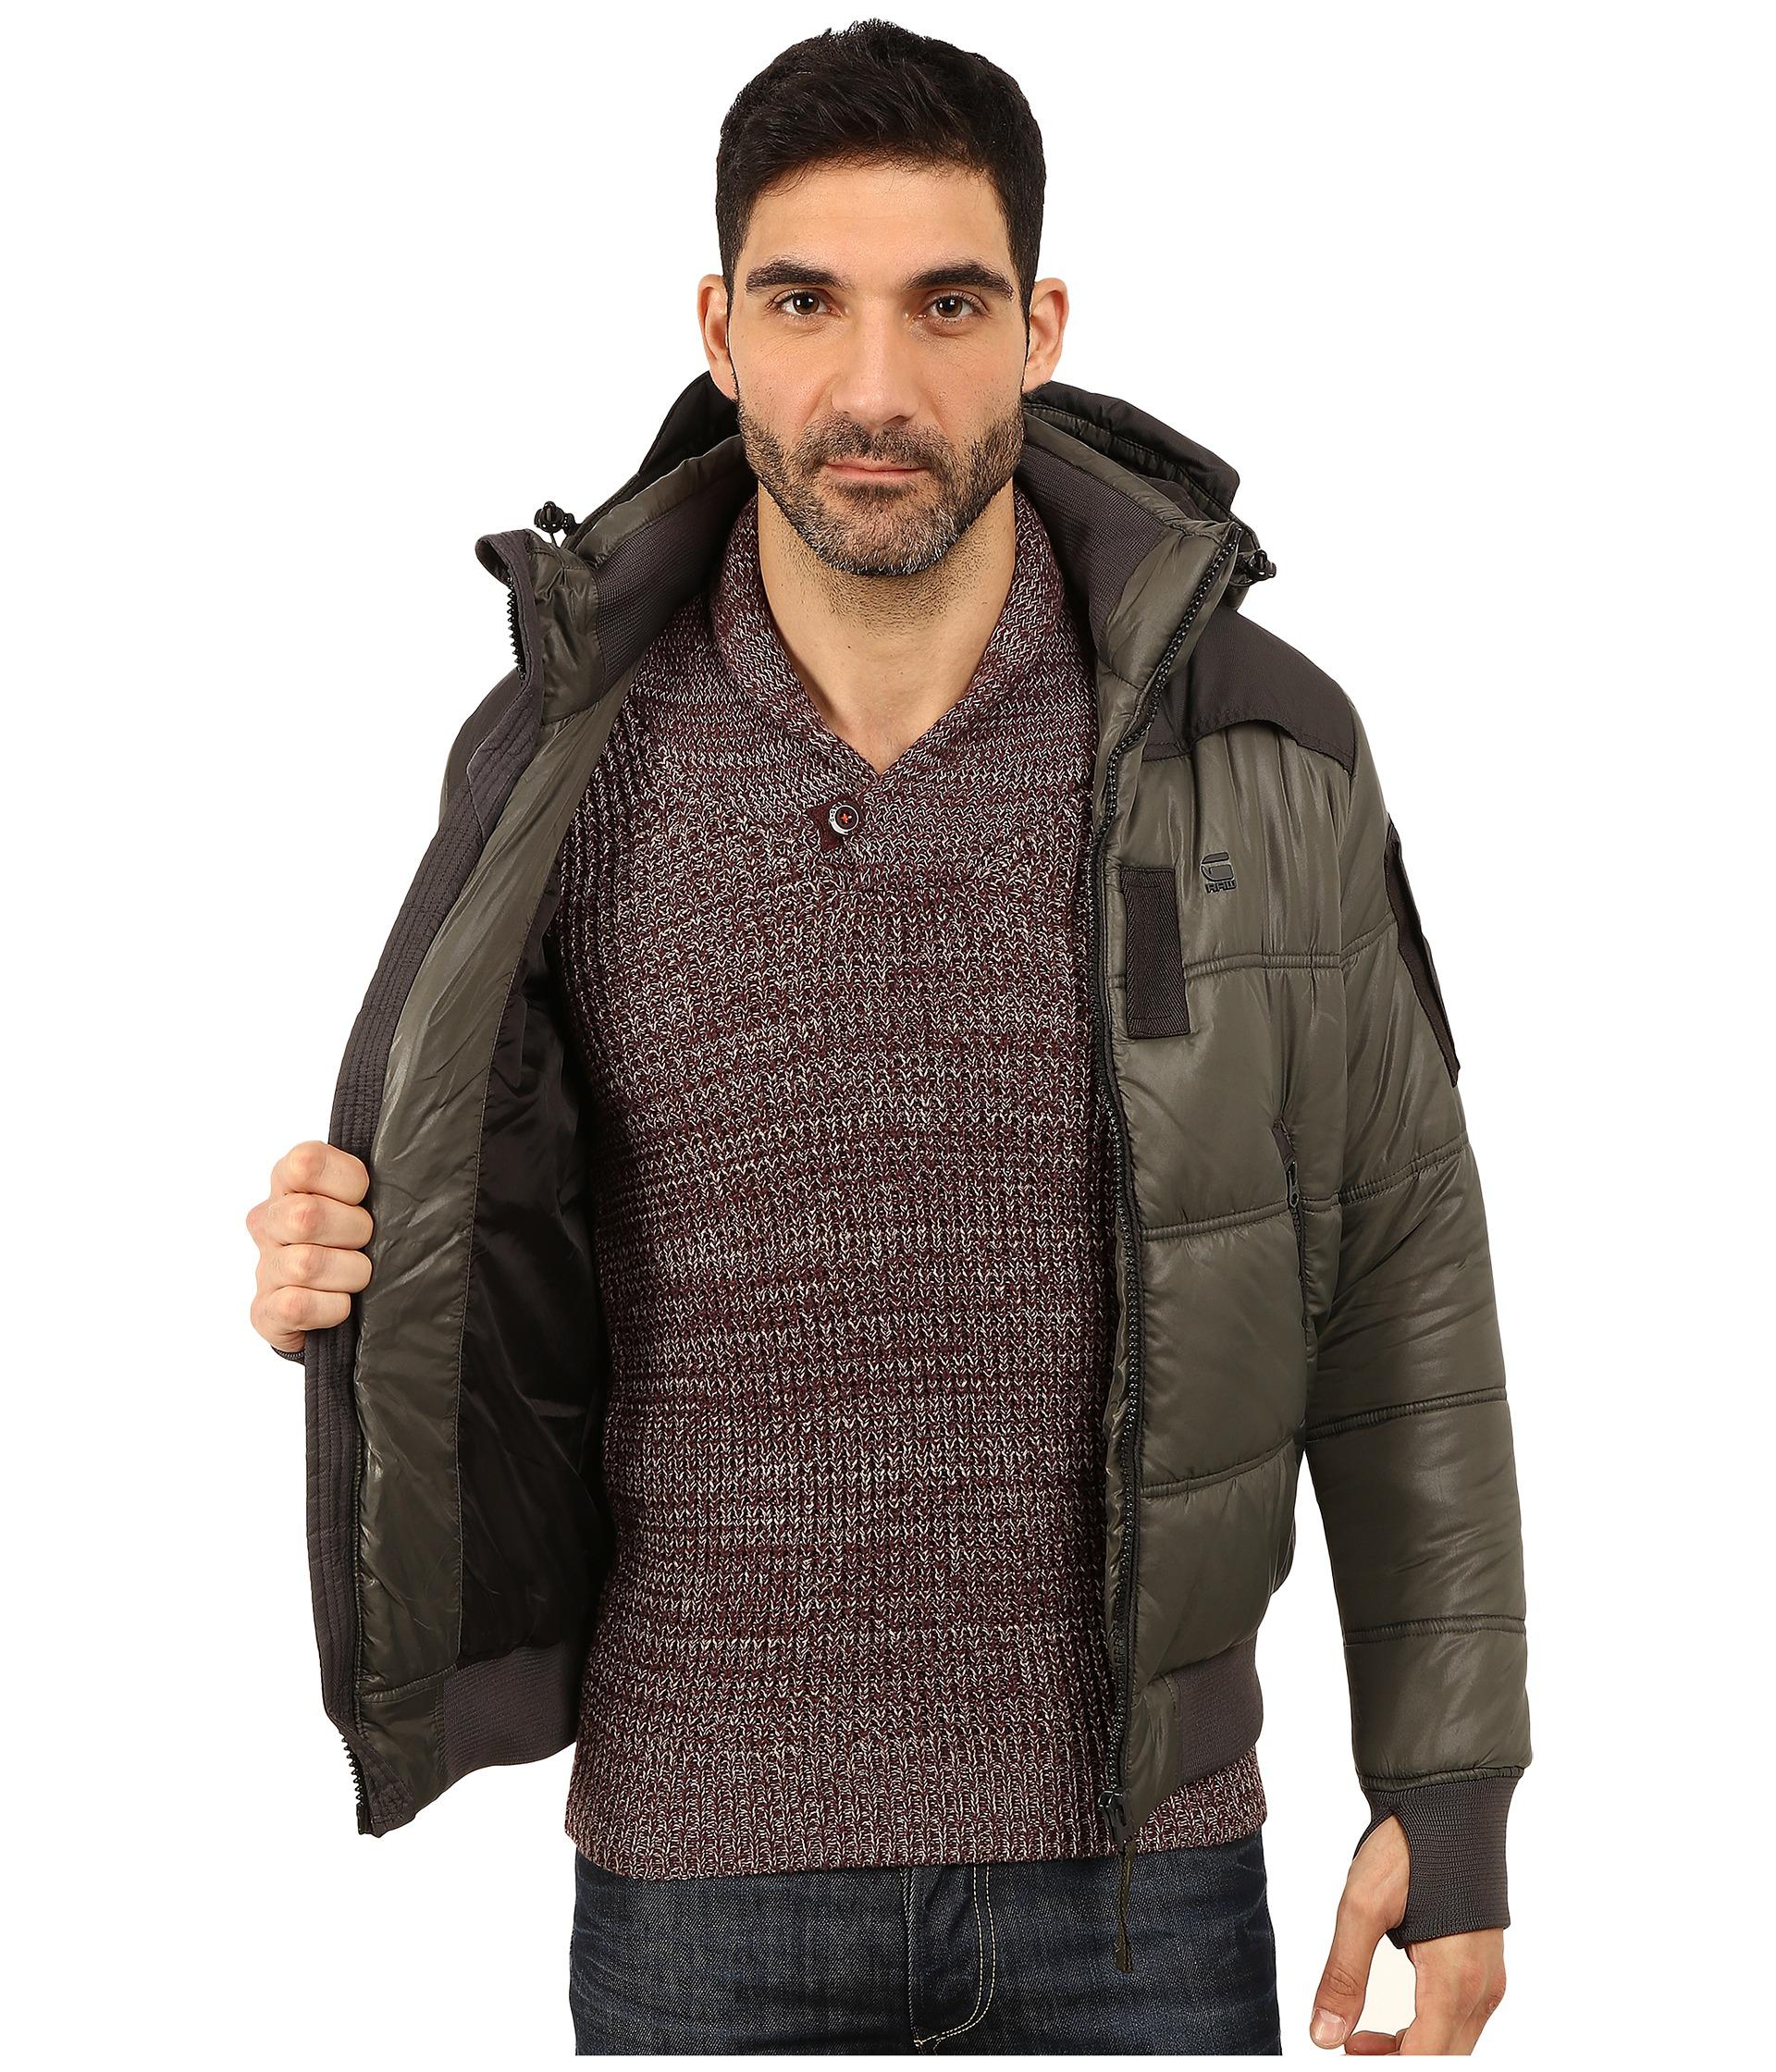 g star raw whistler hooded bomber jacket in gray for men. Black Bedroom Furniture Sets. Home Design Ideas